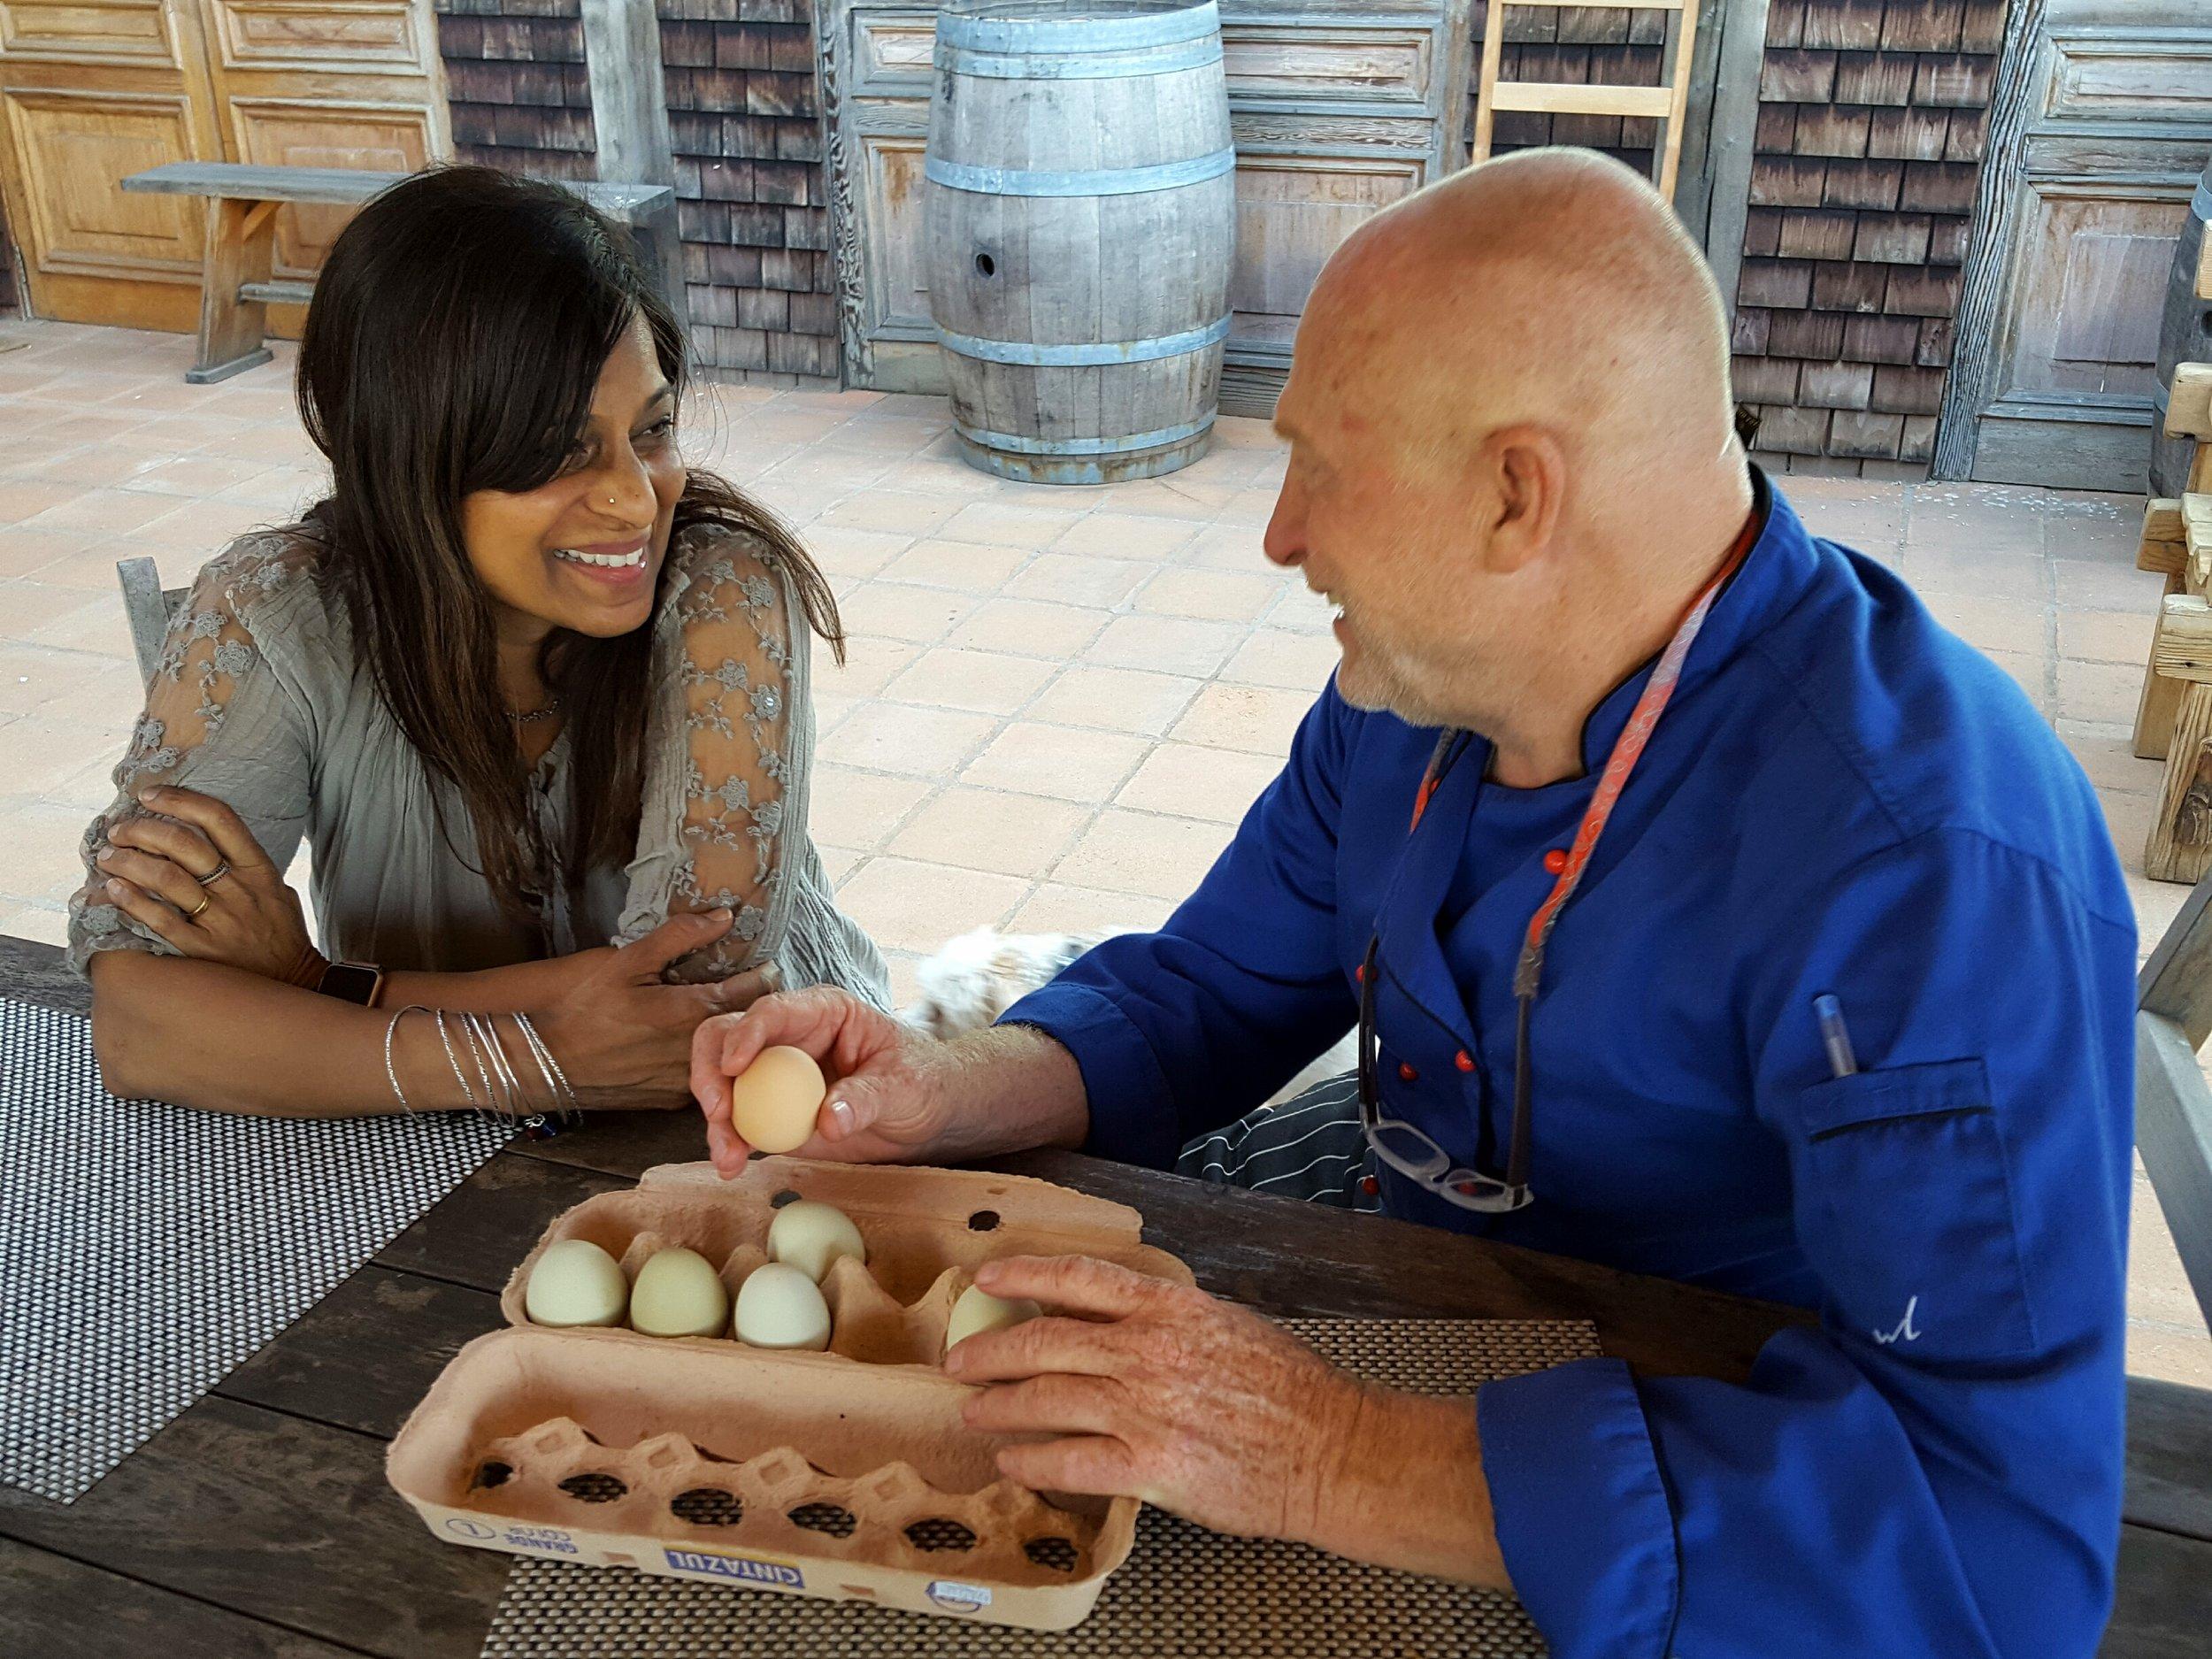 Chef David discusses a recipe with guest Mithra Amaran